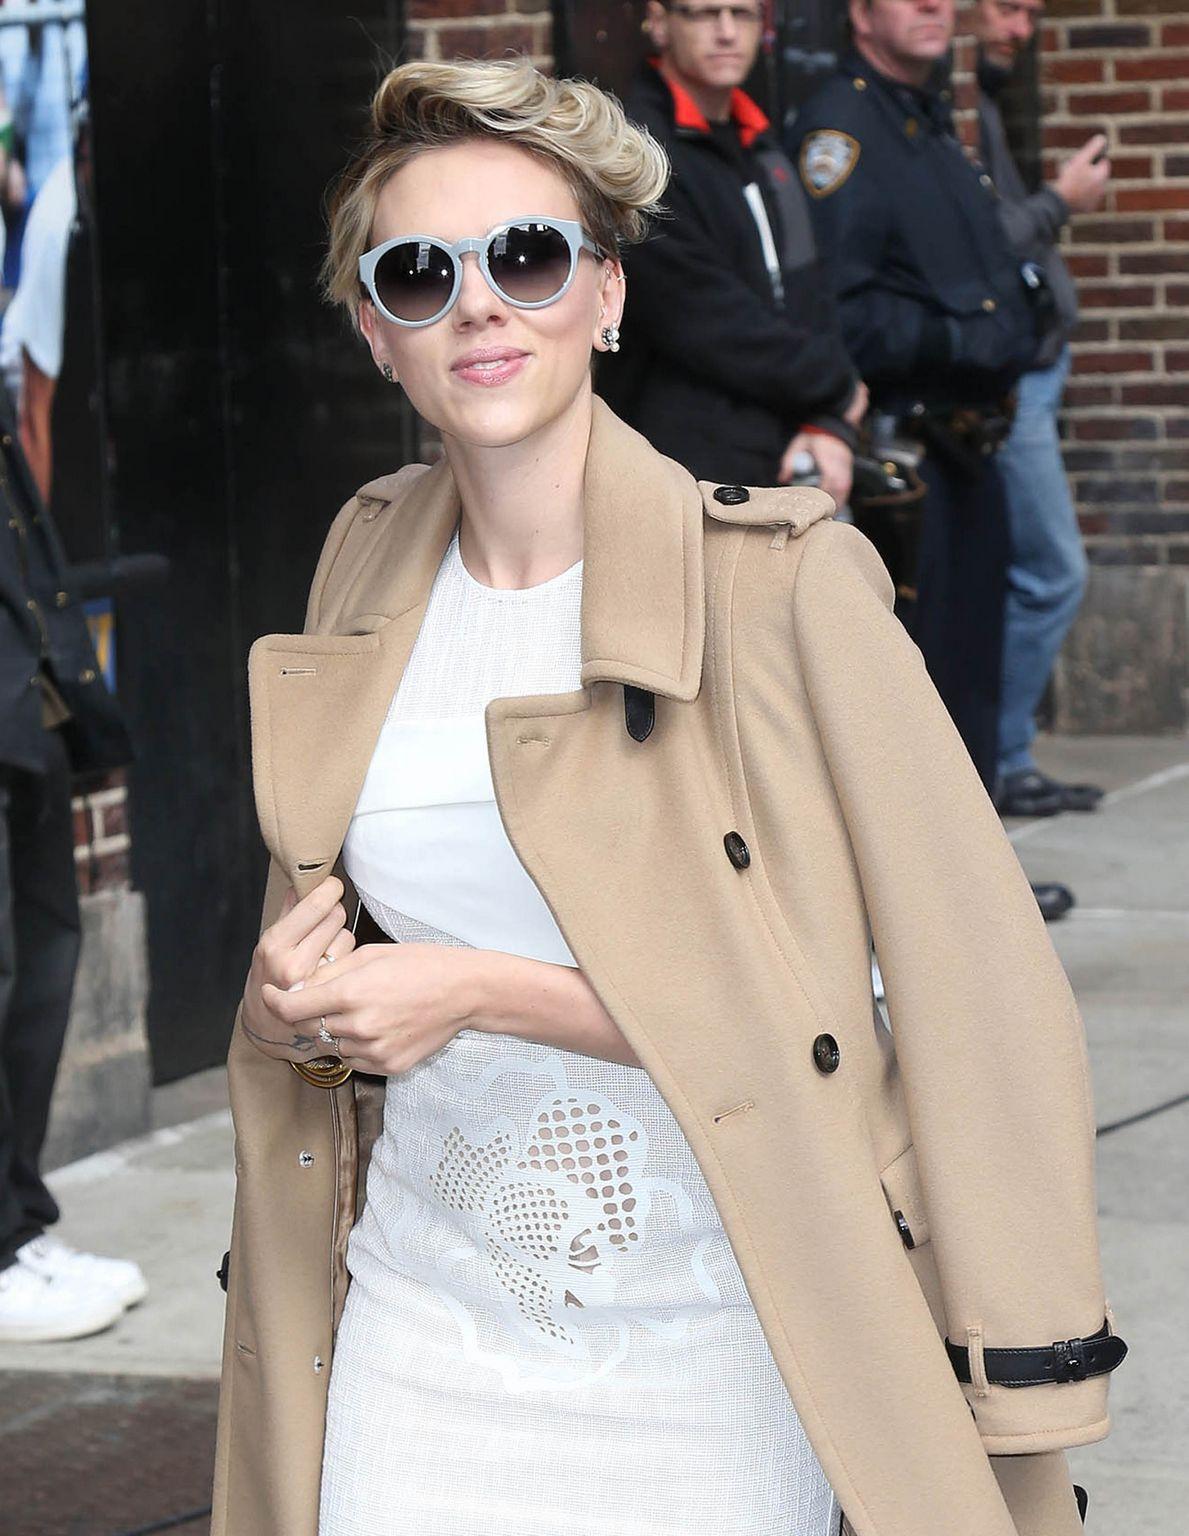 Scarlett Johansson At David Letterman Show-2